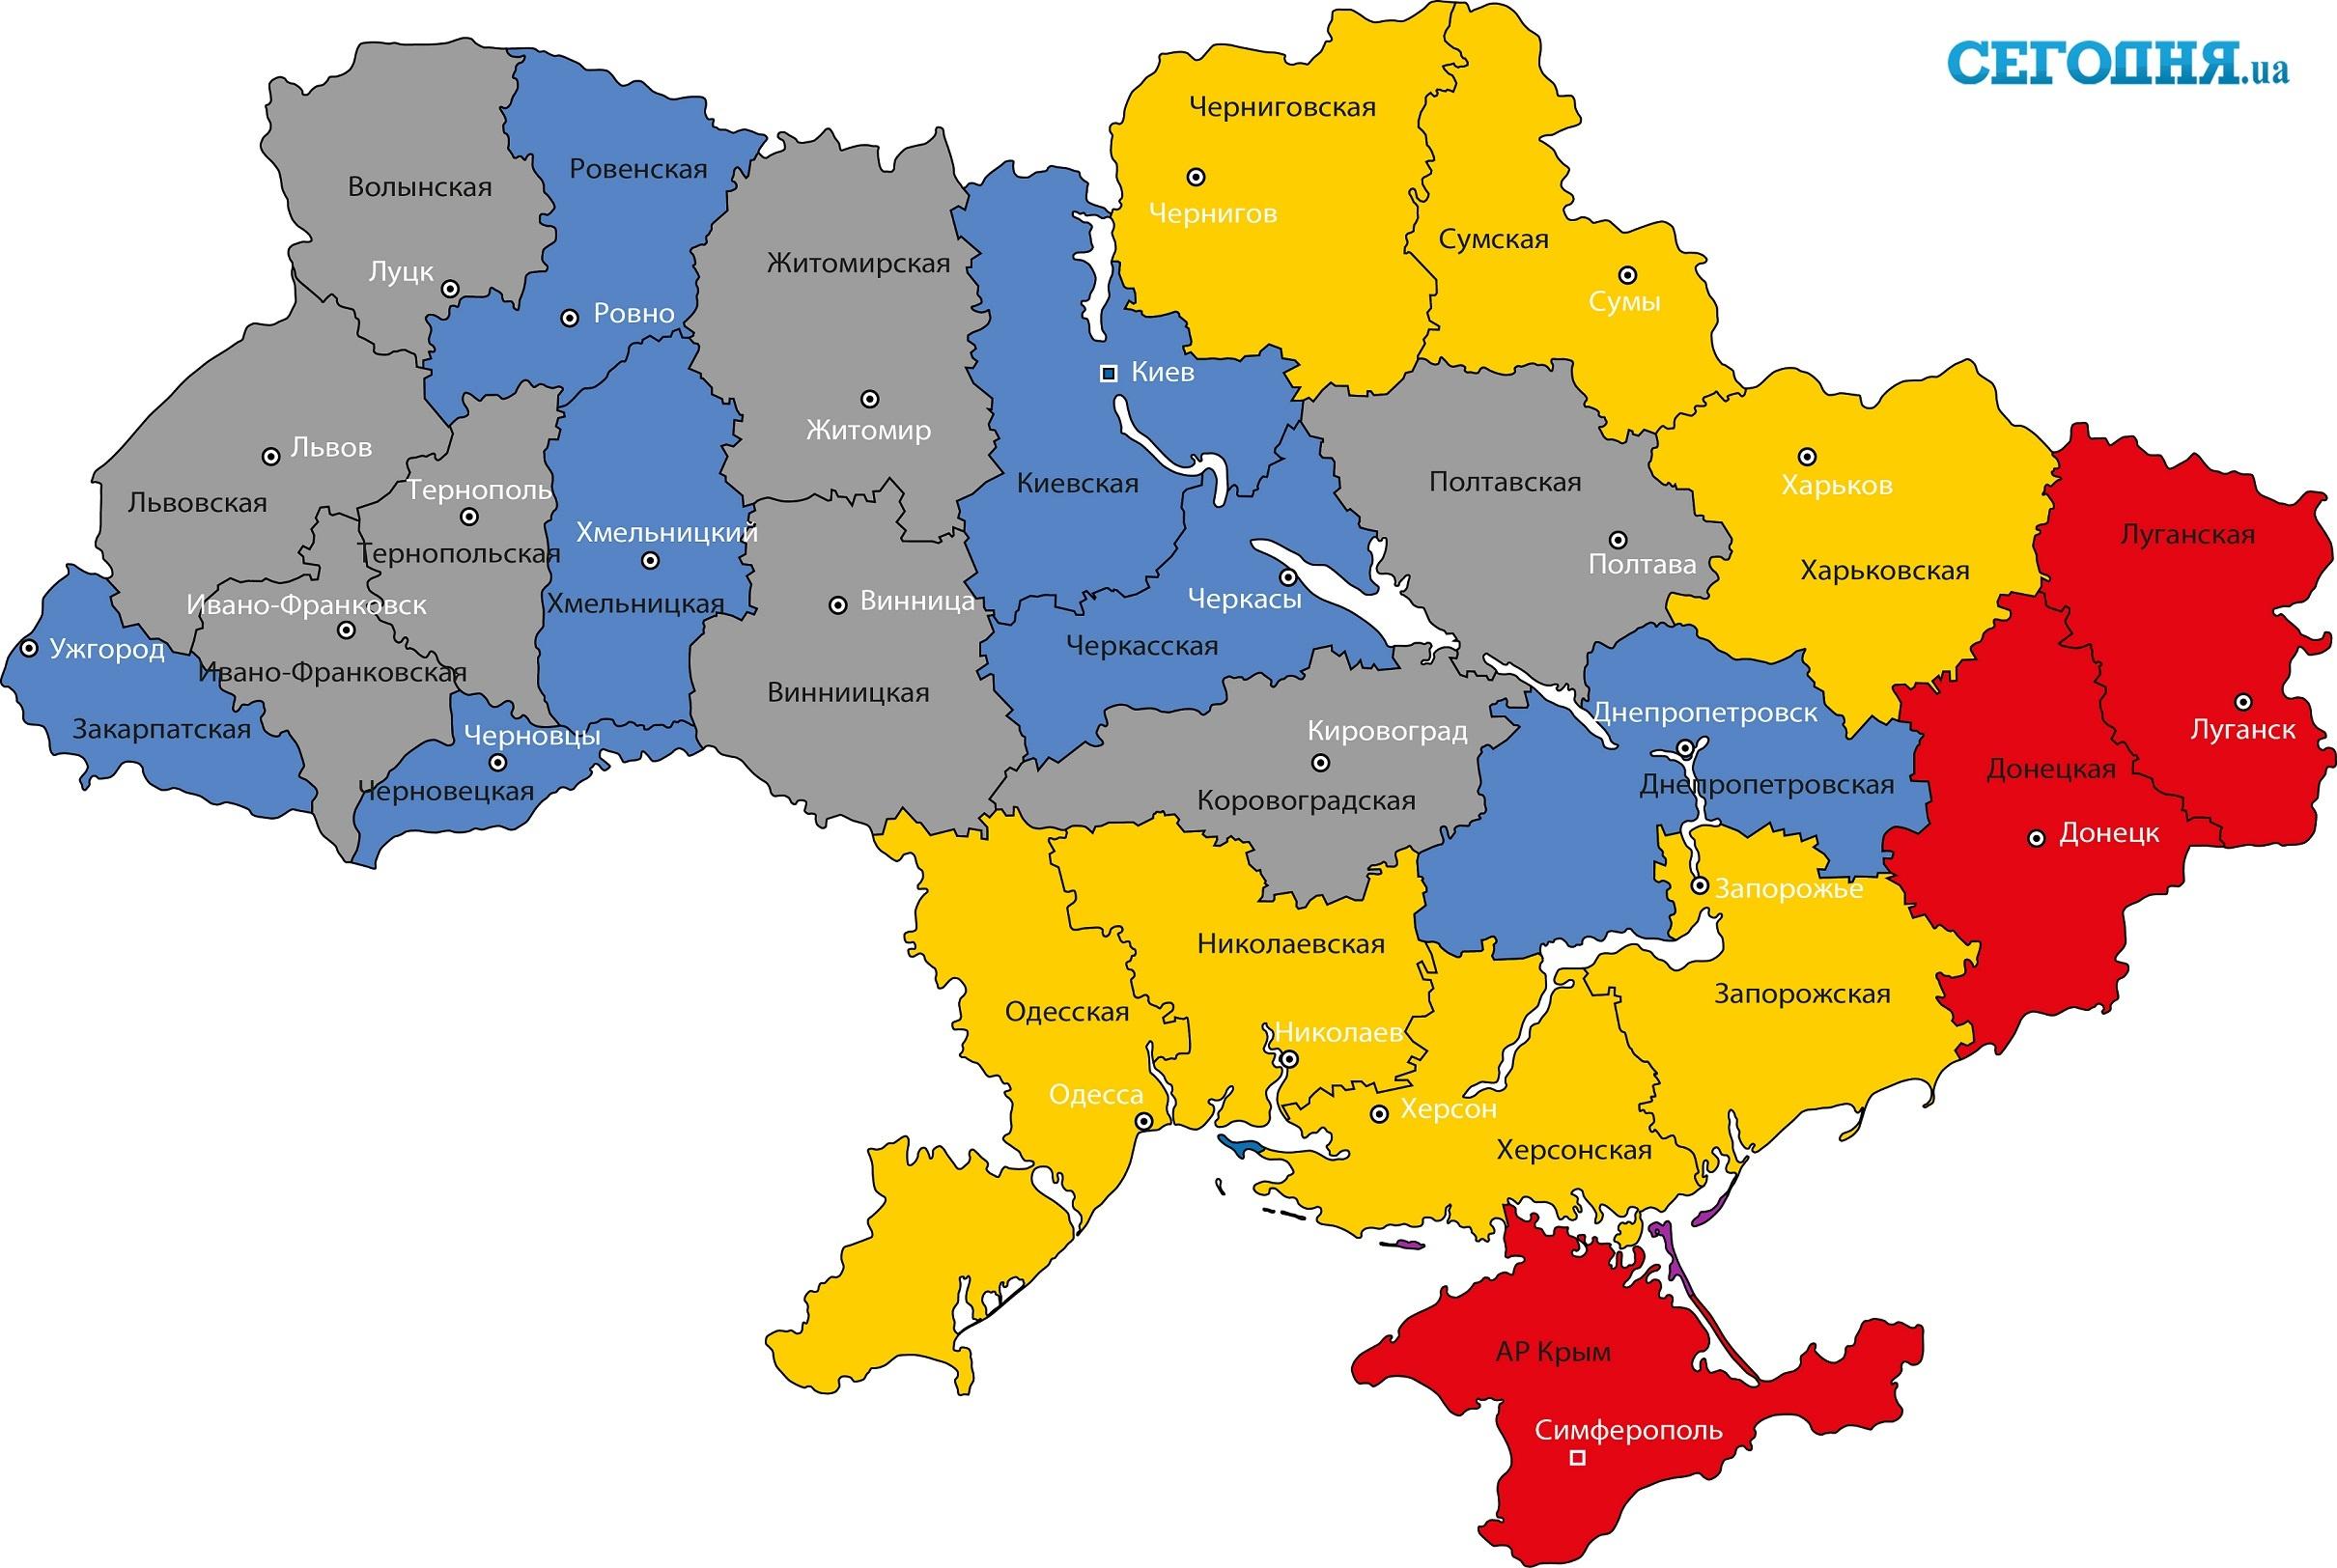 Карта террористических угроз в Украине - Новости Украины ...: http://www.segodnya.ua/ukraine/opublikovana-karta-terroristicheskih-ugroz-v-ukraine-742832.html